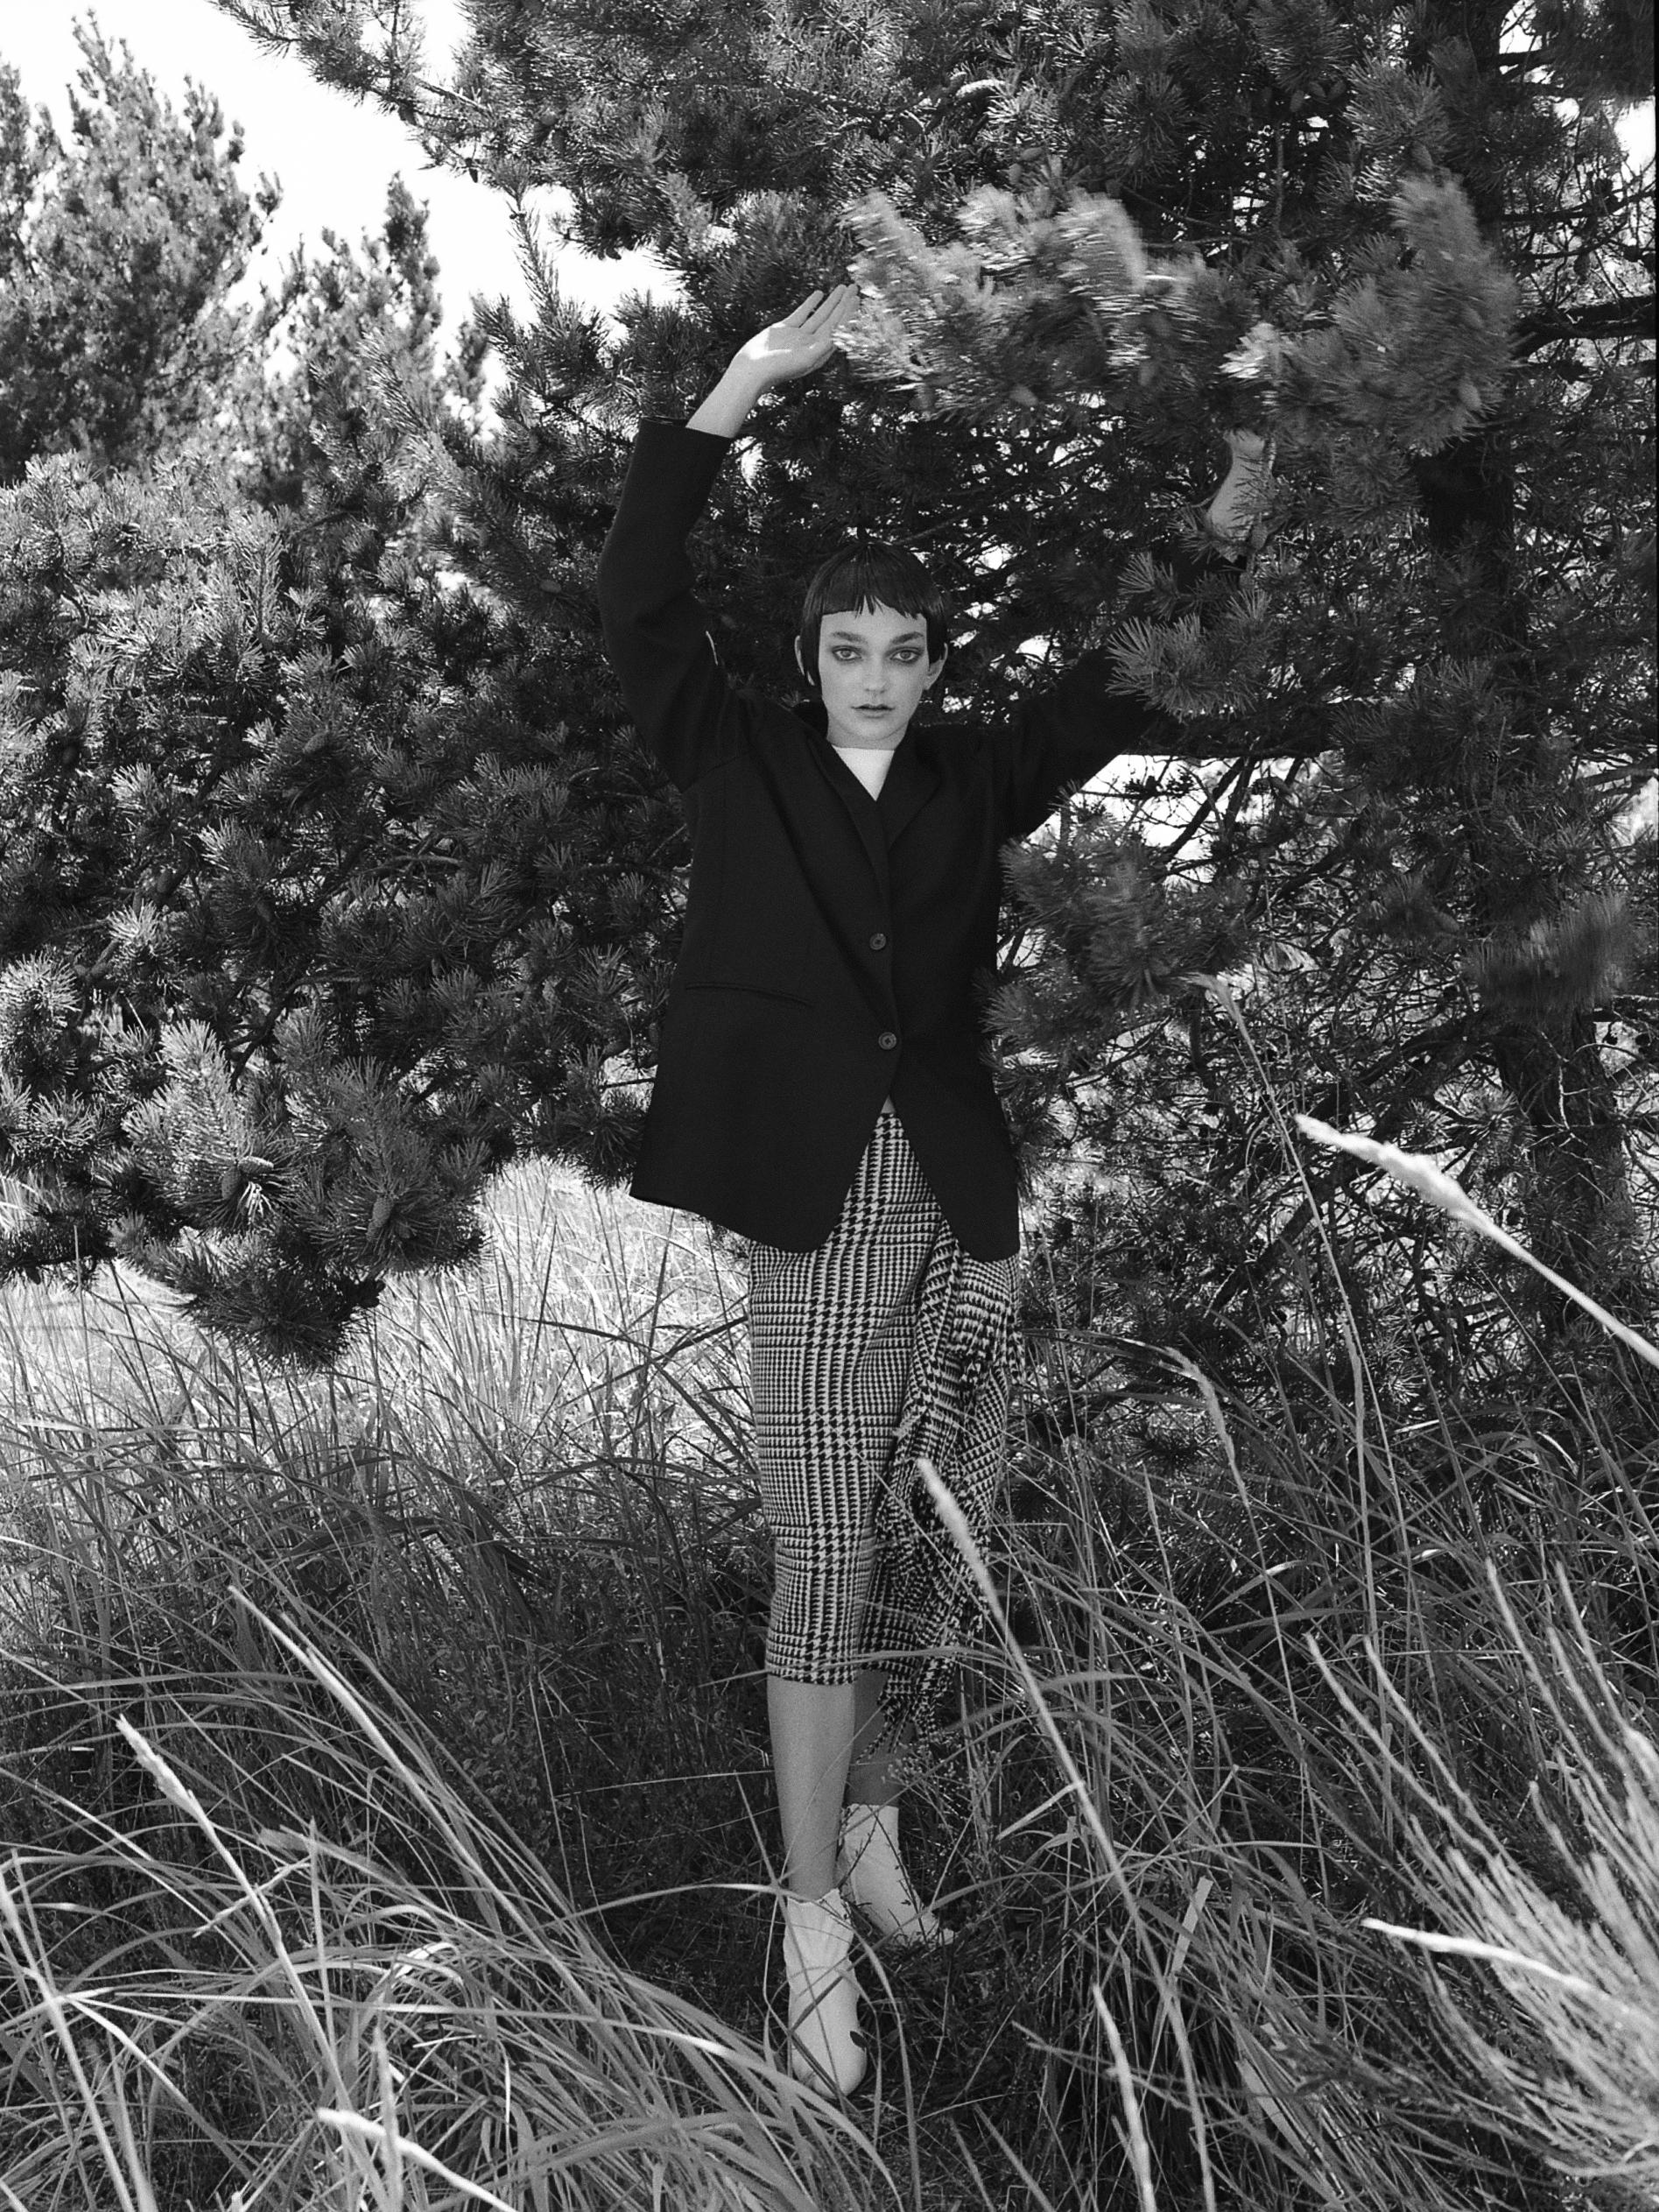 Skirt - Balenciaga, Blazer - Vintage (stylist own), T-shirt - Hanes